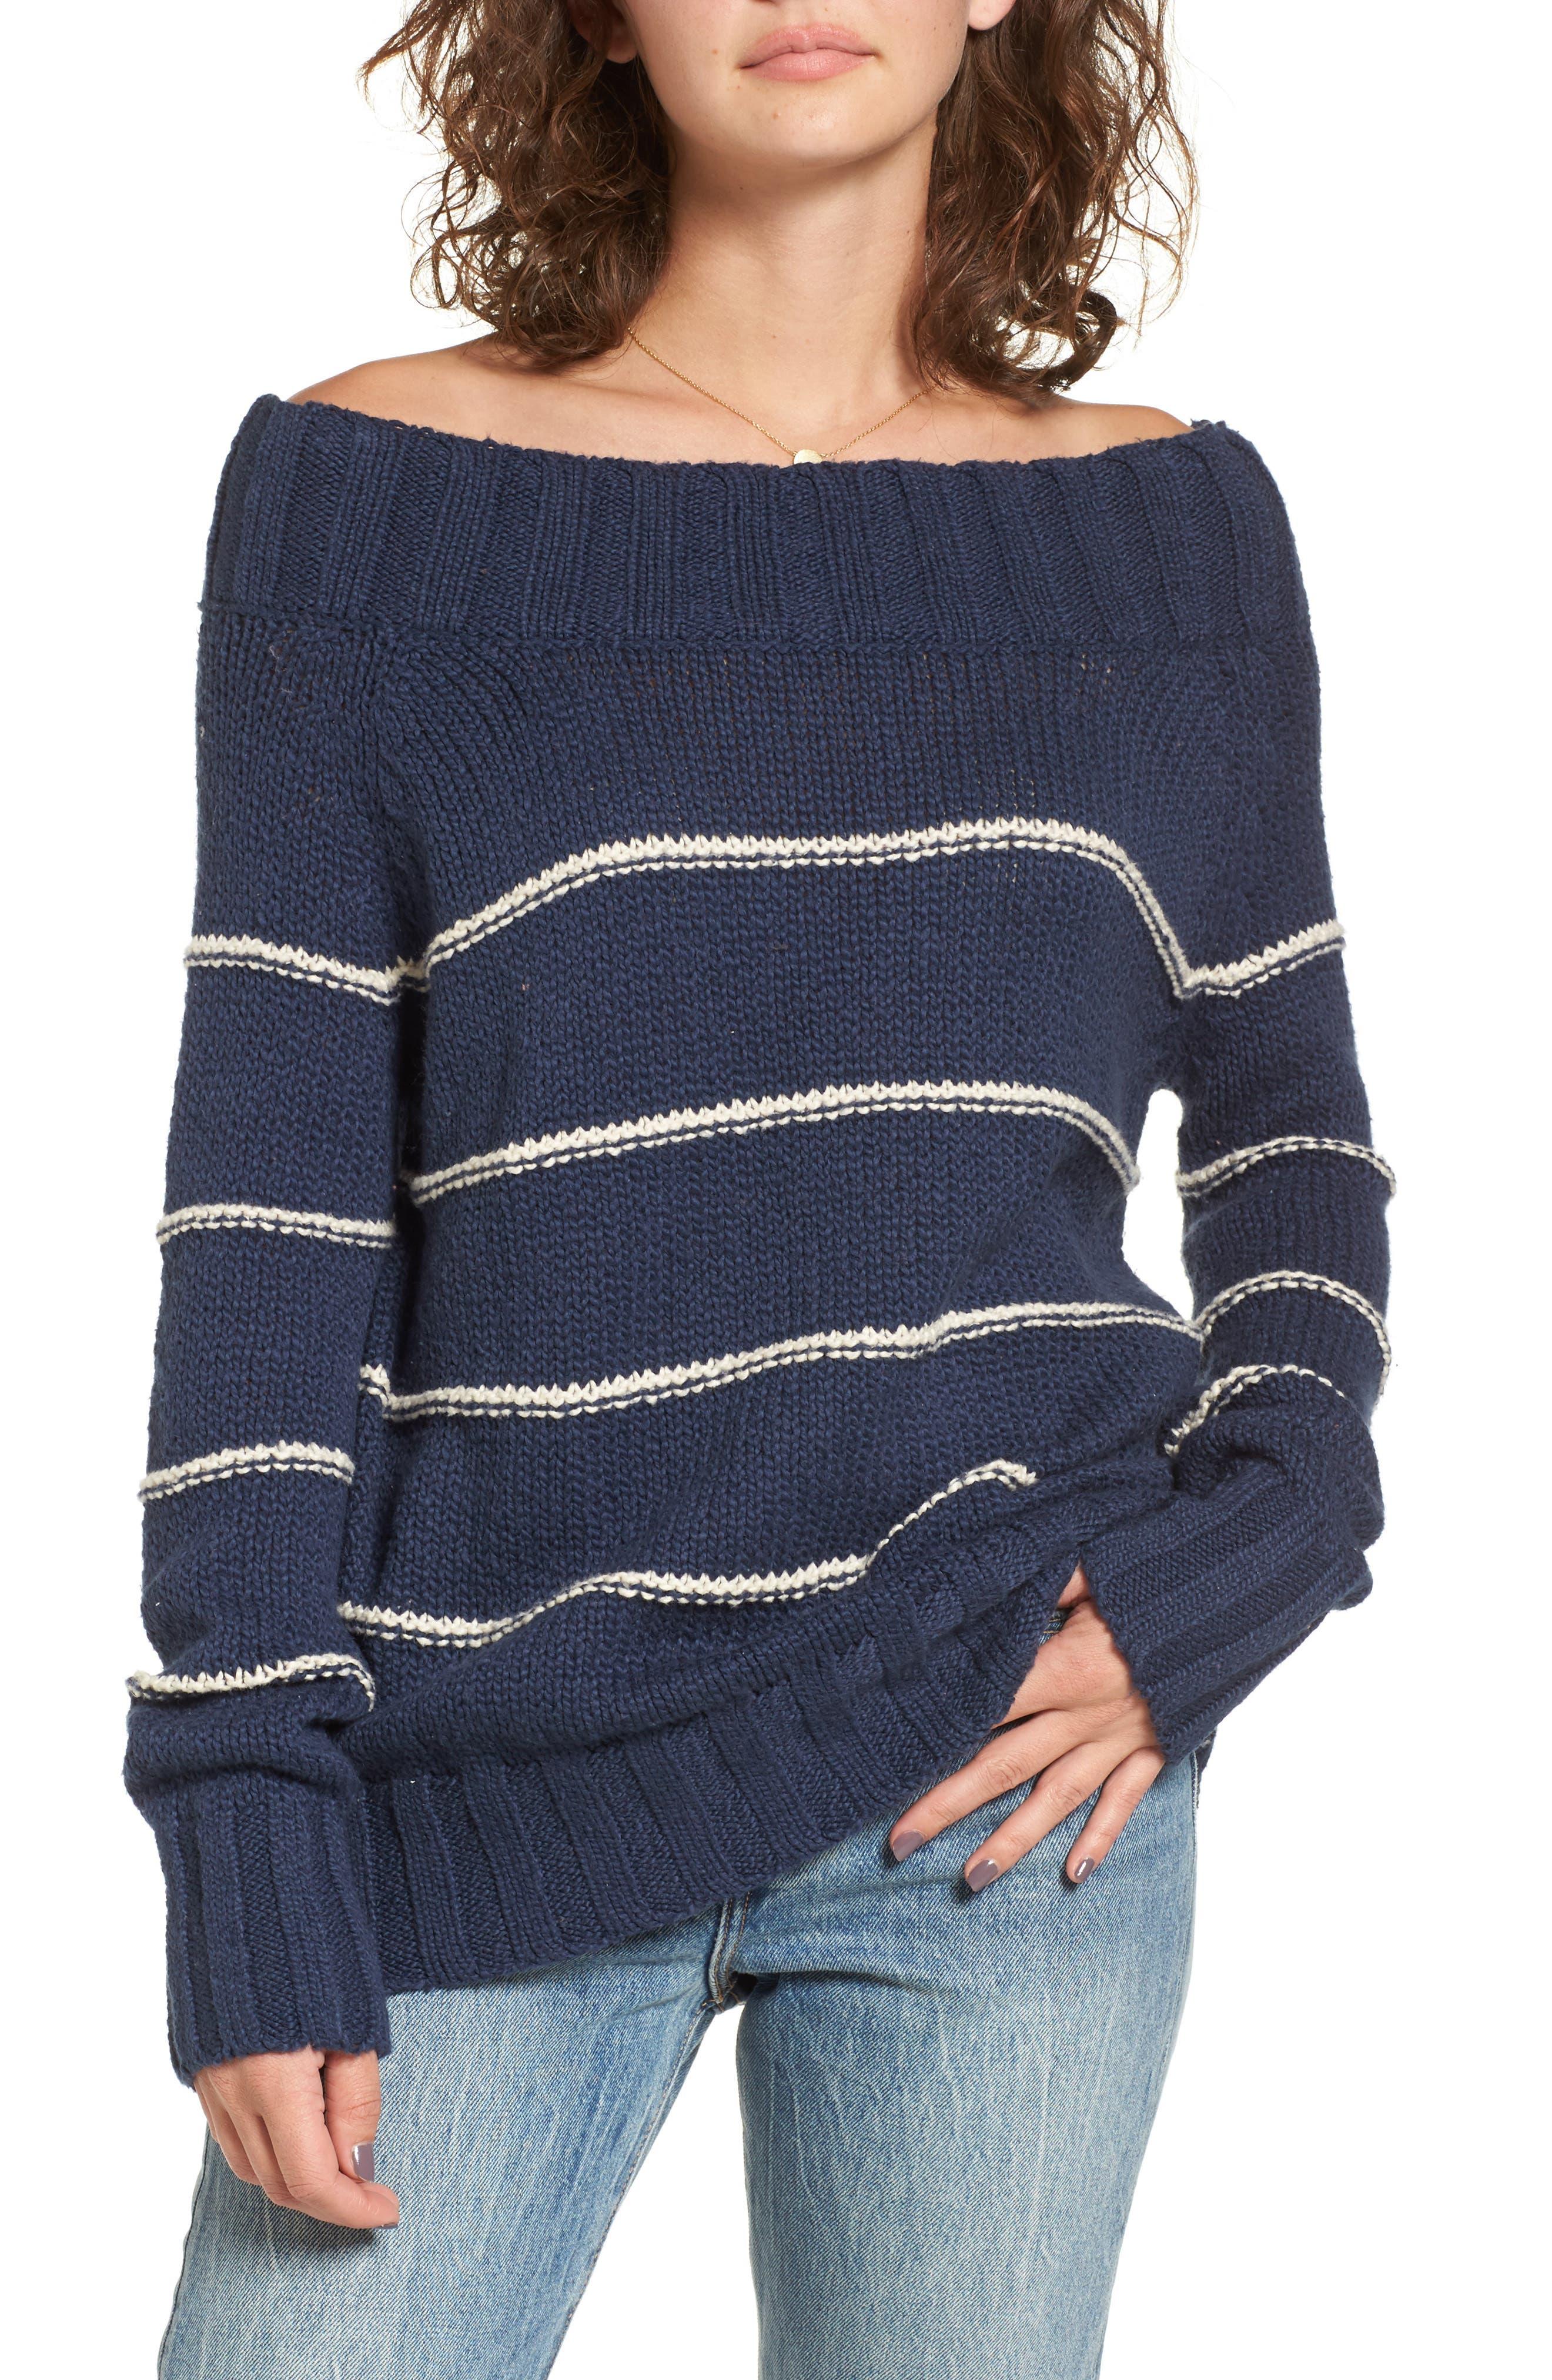 Billabong Snuggle Down Off the Shoulder Sweater